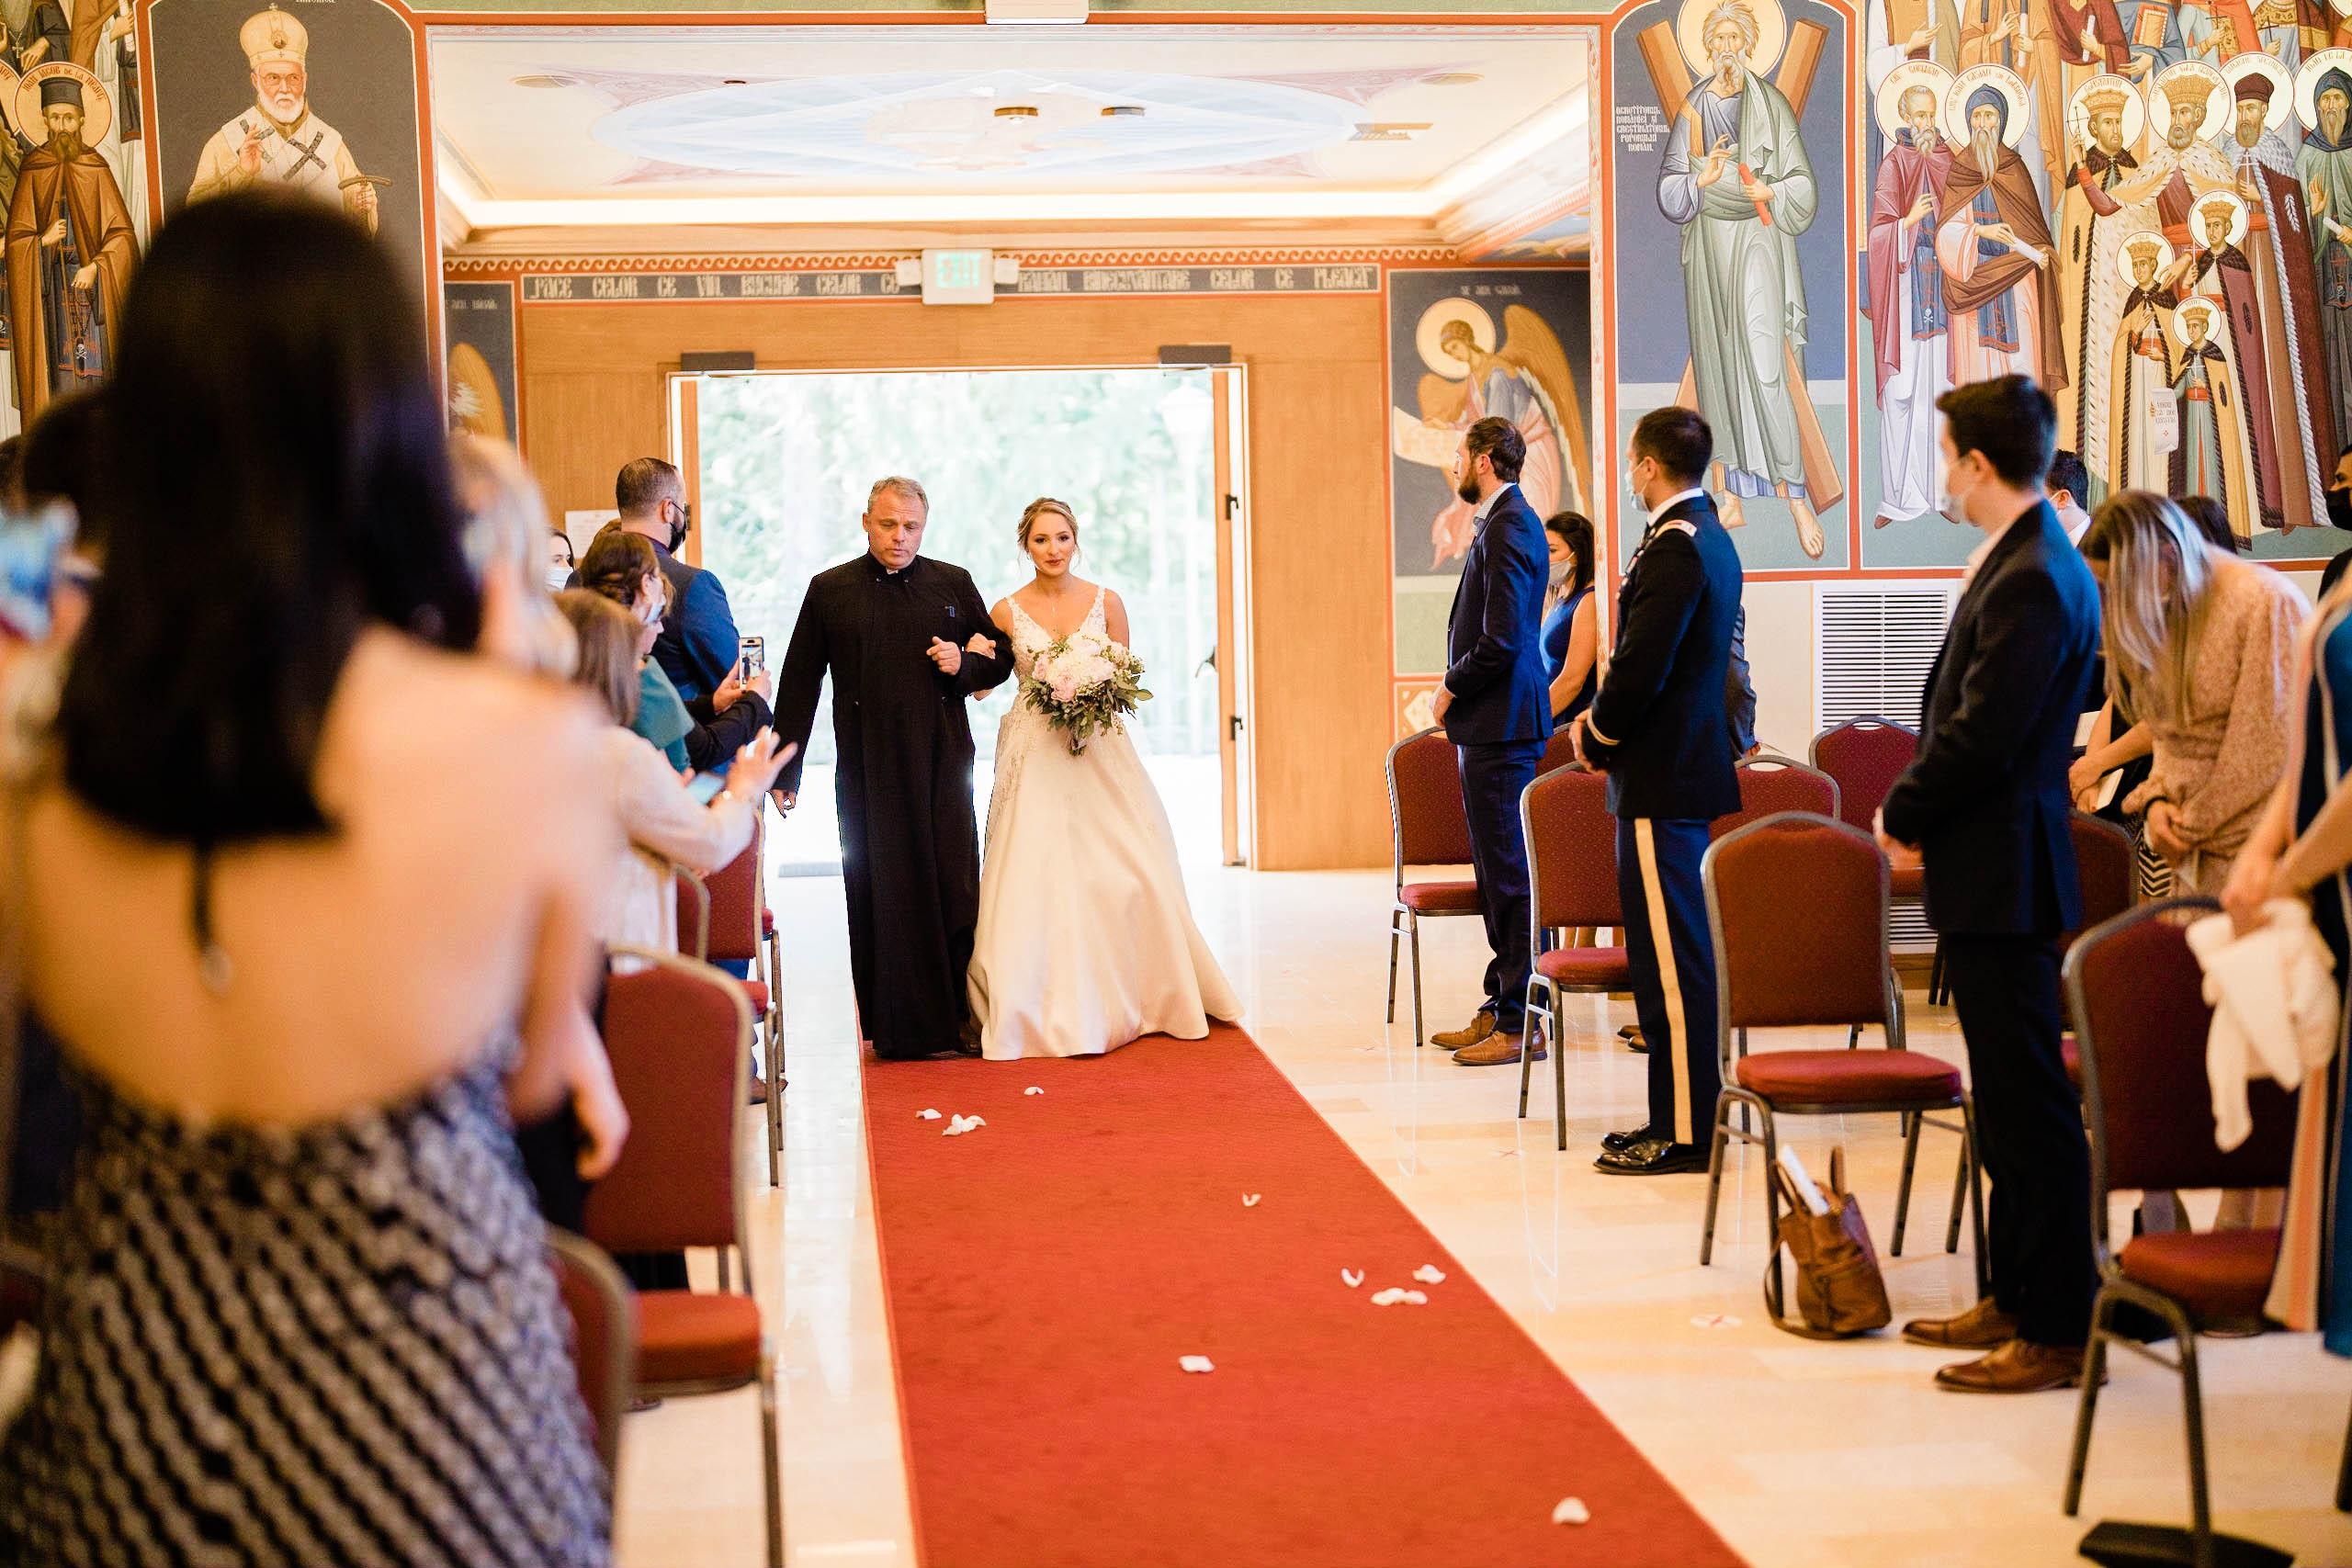 bride walks down aisle at Romanian Orthodox Church in Mountlake terrace